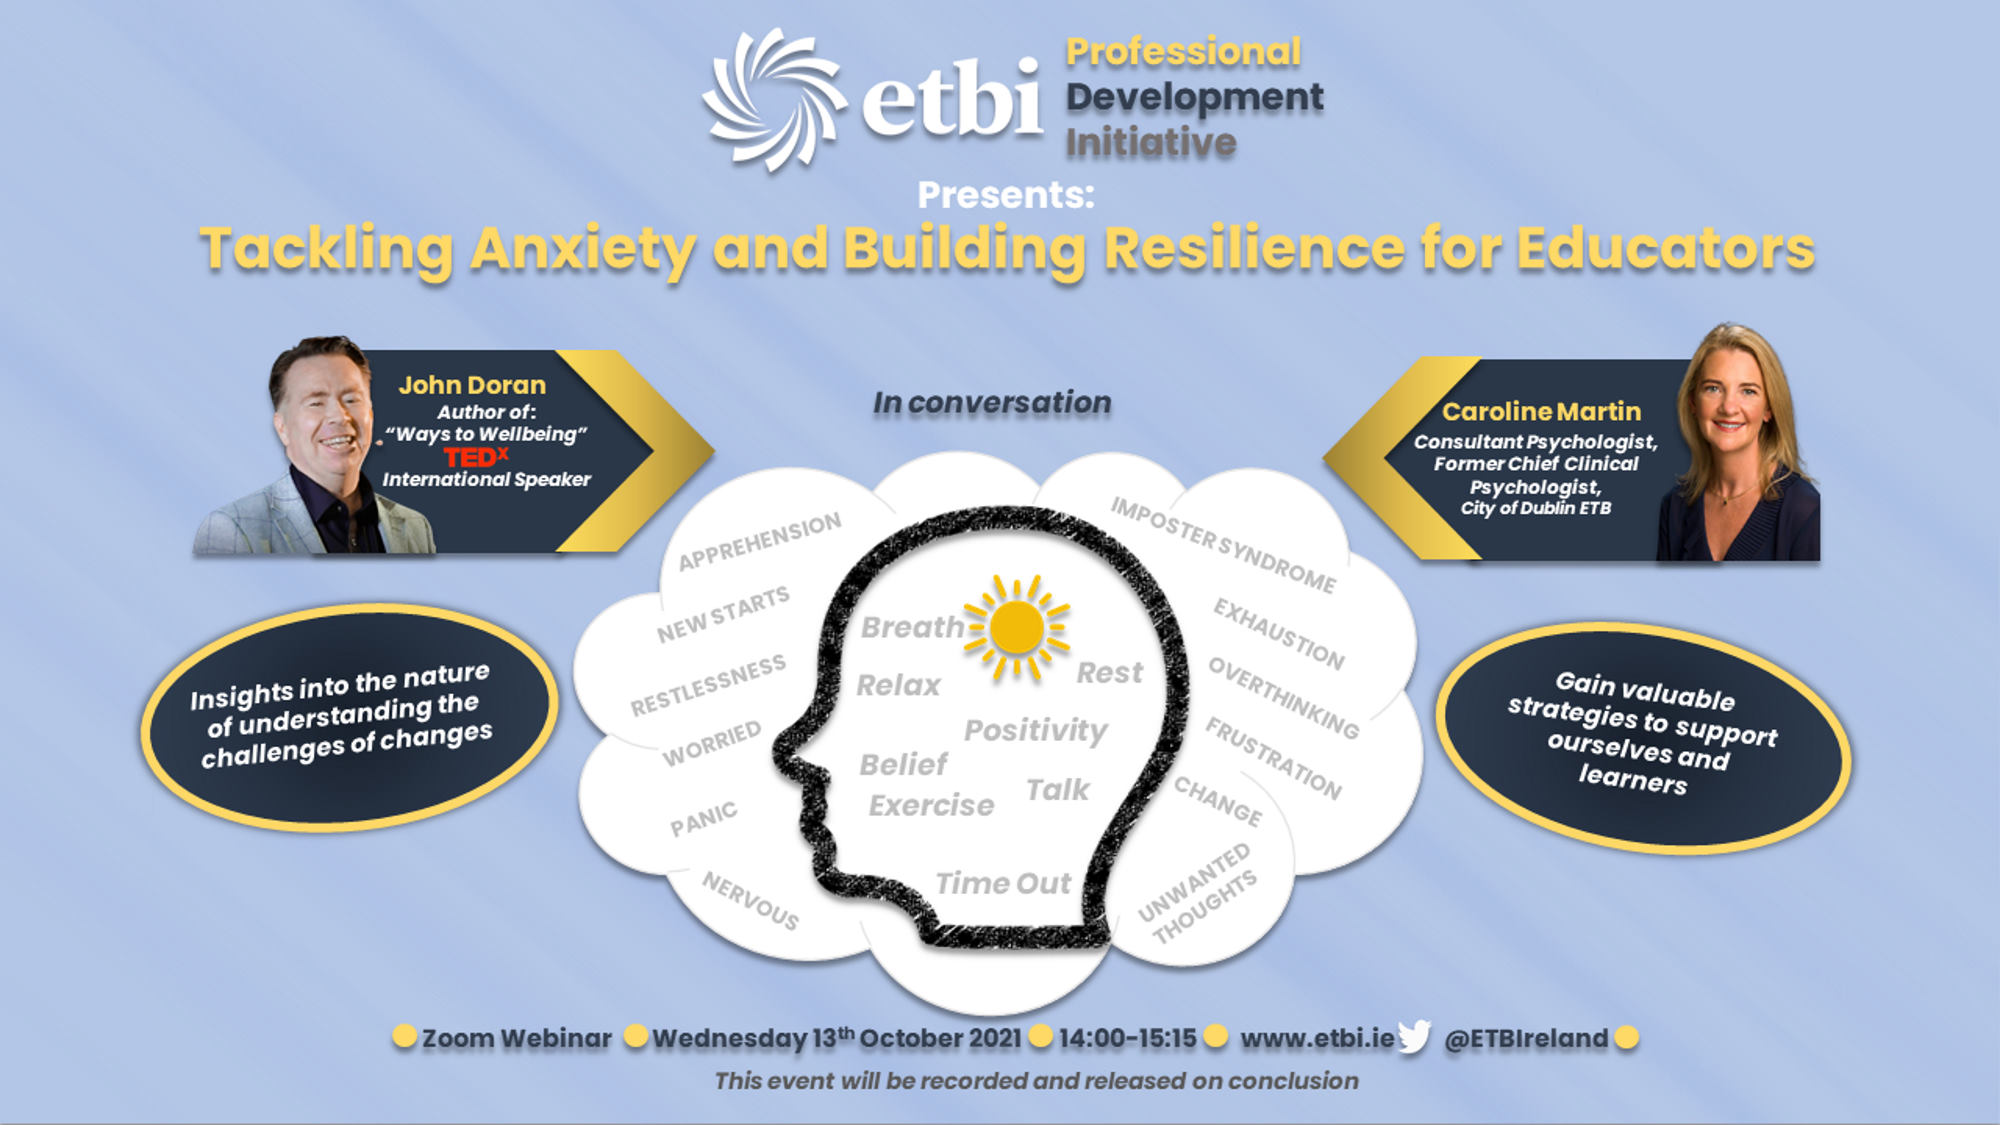 https://www.etbi.ie/wp-content/uploads/2021/10/Professional-Development-Webinar-Social-Media.jpg